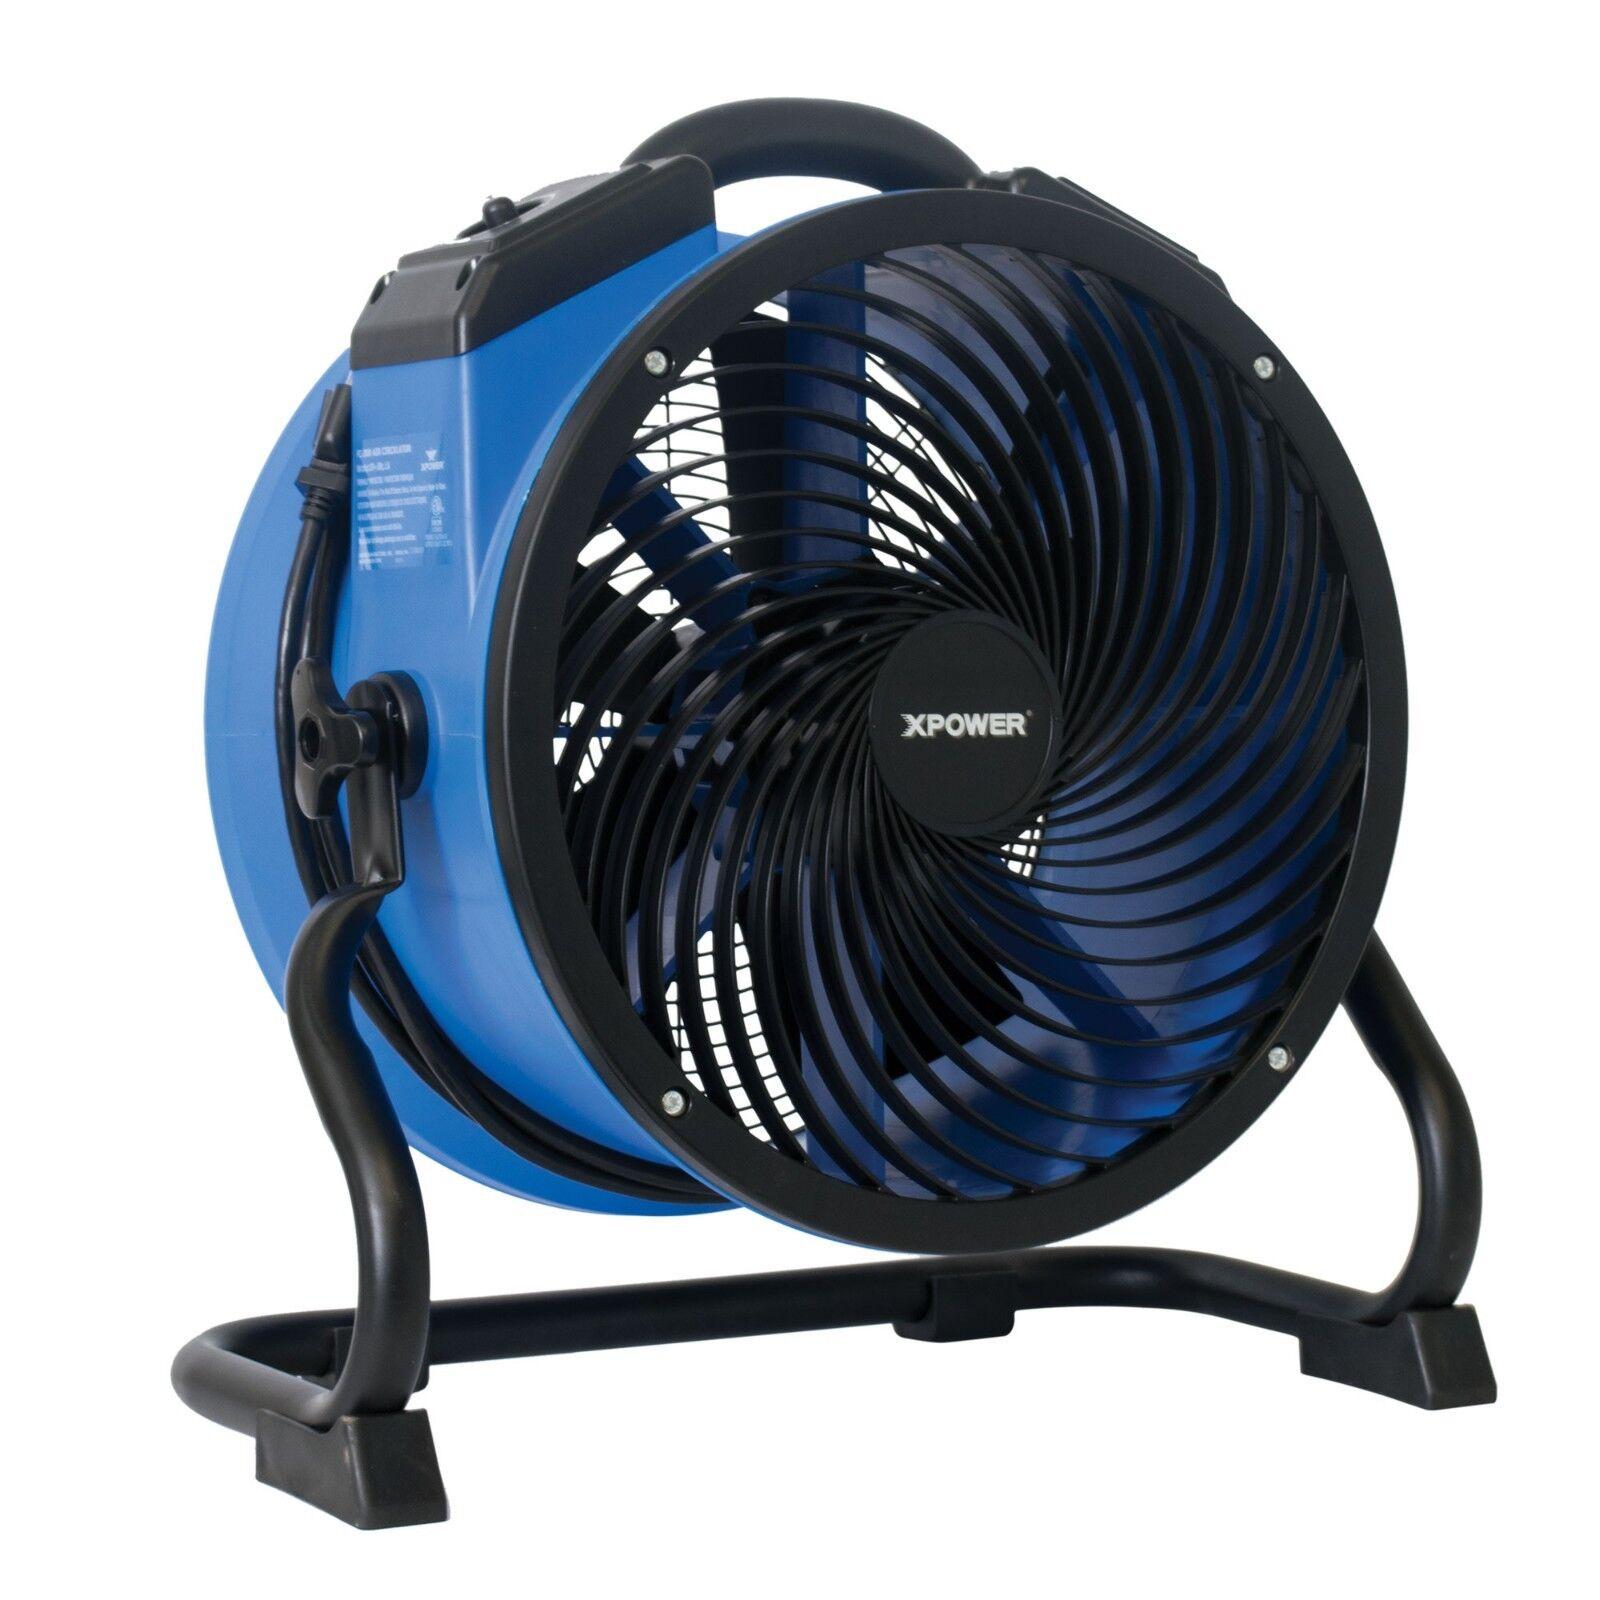 XPOWER FC-300 Professional Grade Air Circulator, Utility Fan